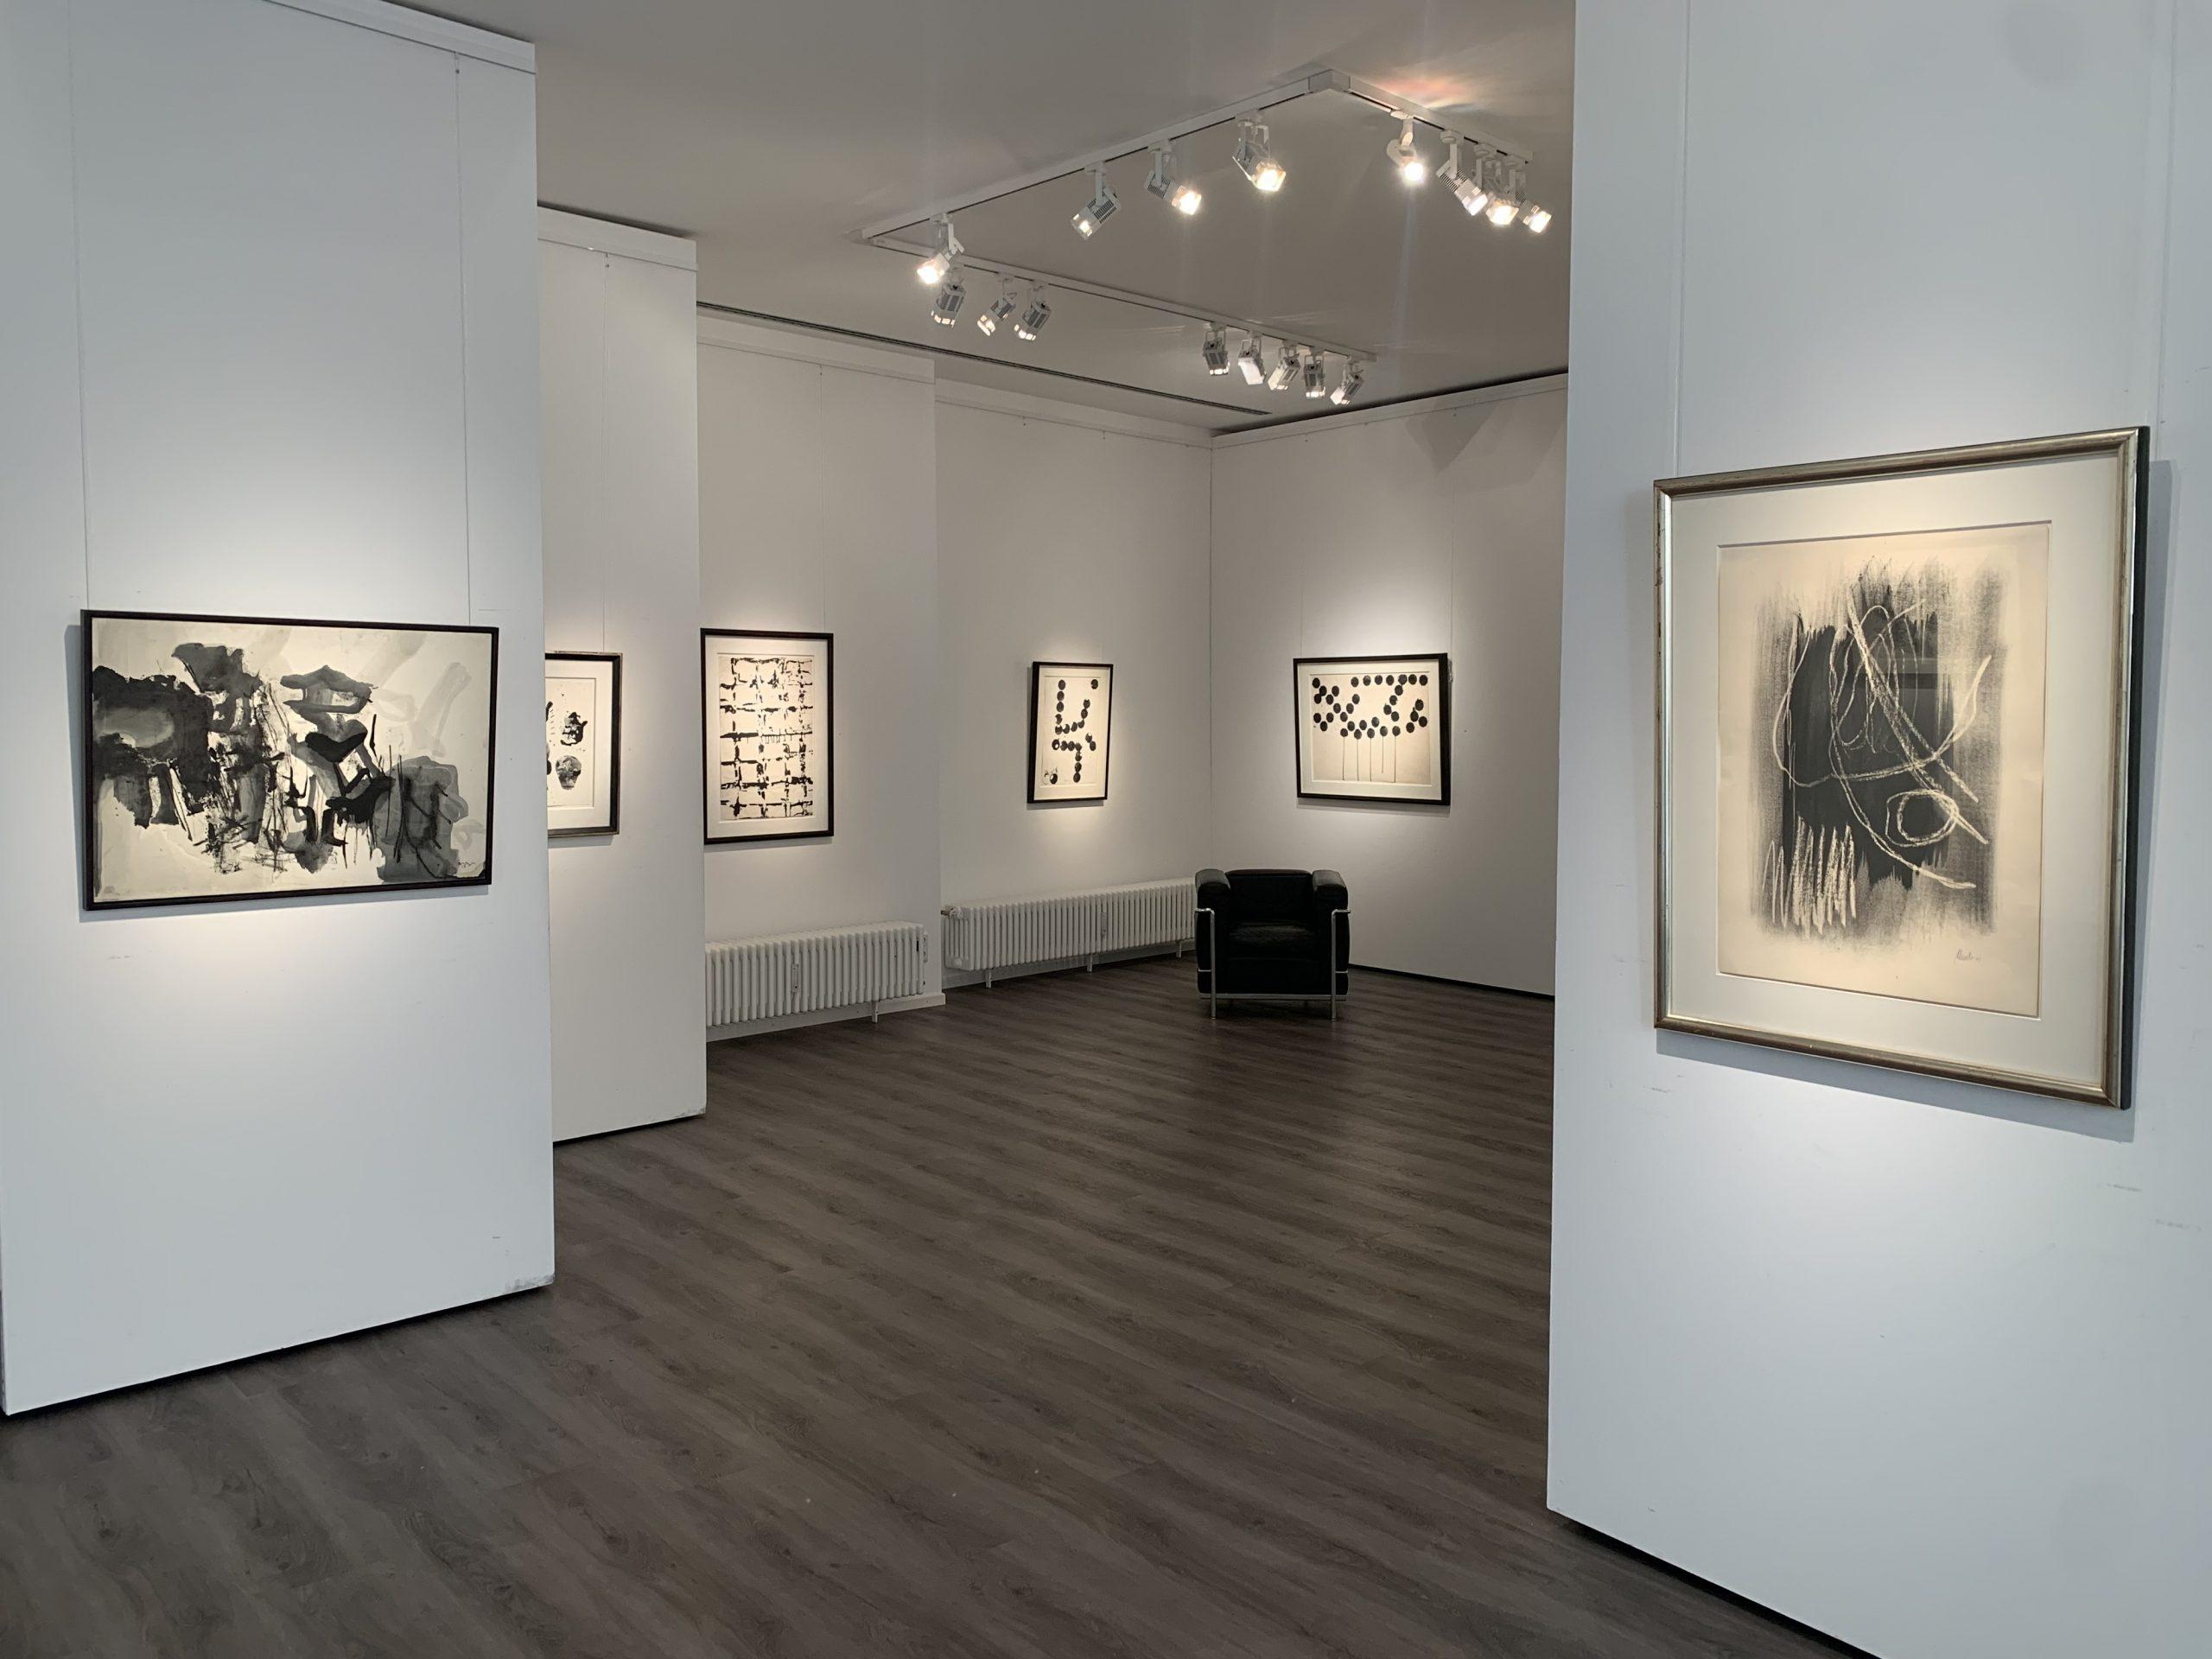 Ausstellung Black meets White 2021 Galerie Maulberger 01